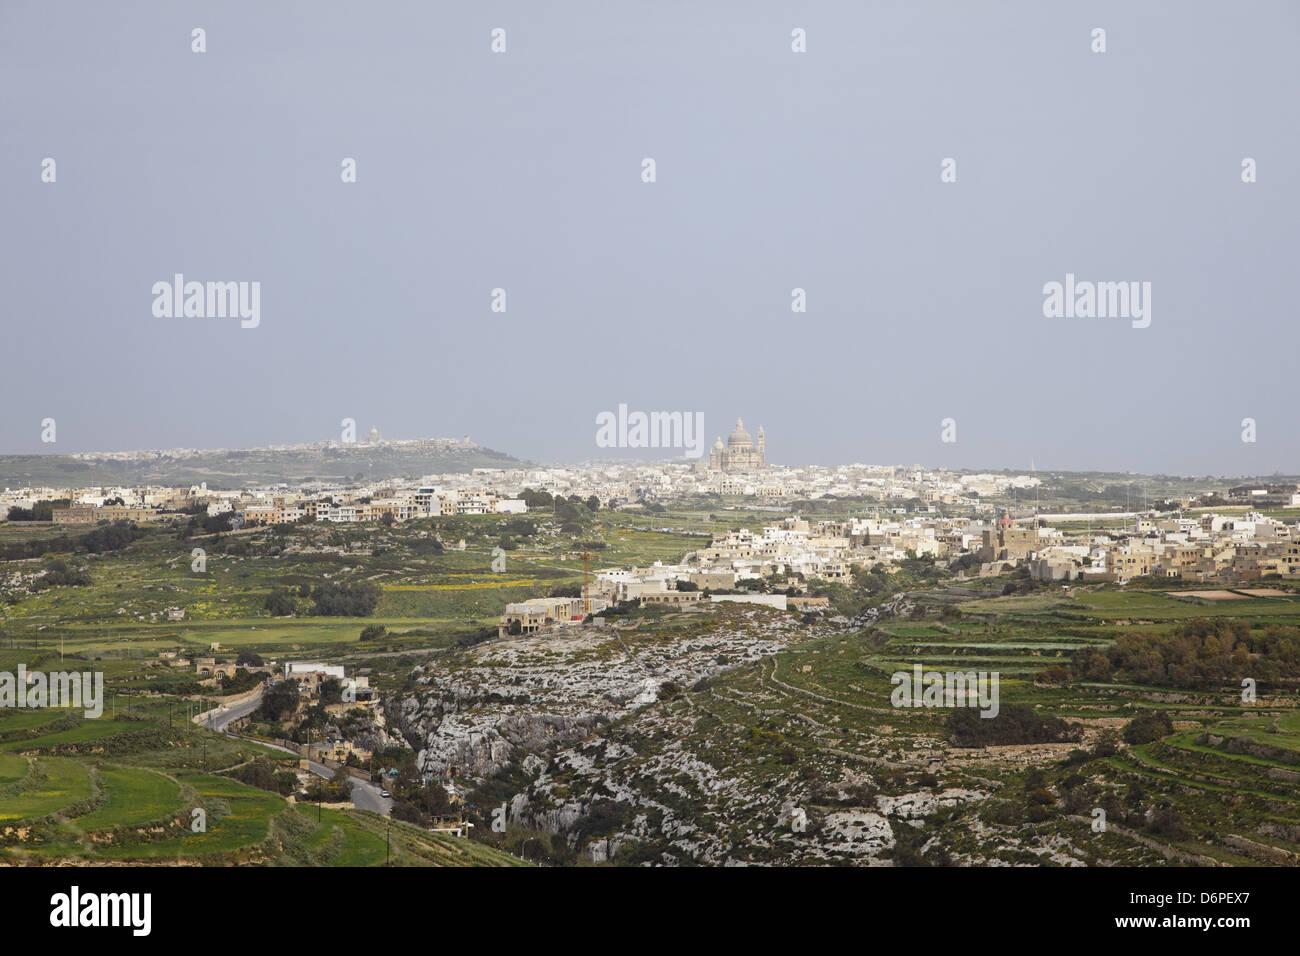 Malta, Gozo, Xlendi, View of Xewkija, city, church peaceful, harmonious, Malta, Gozo, Xlendi, Blick auf Xewkija, - Stock Image